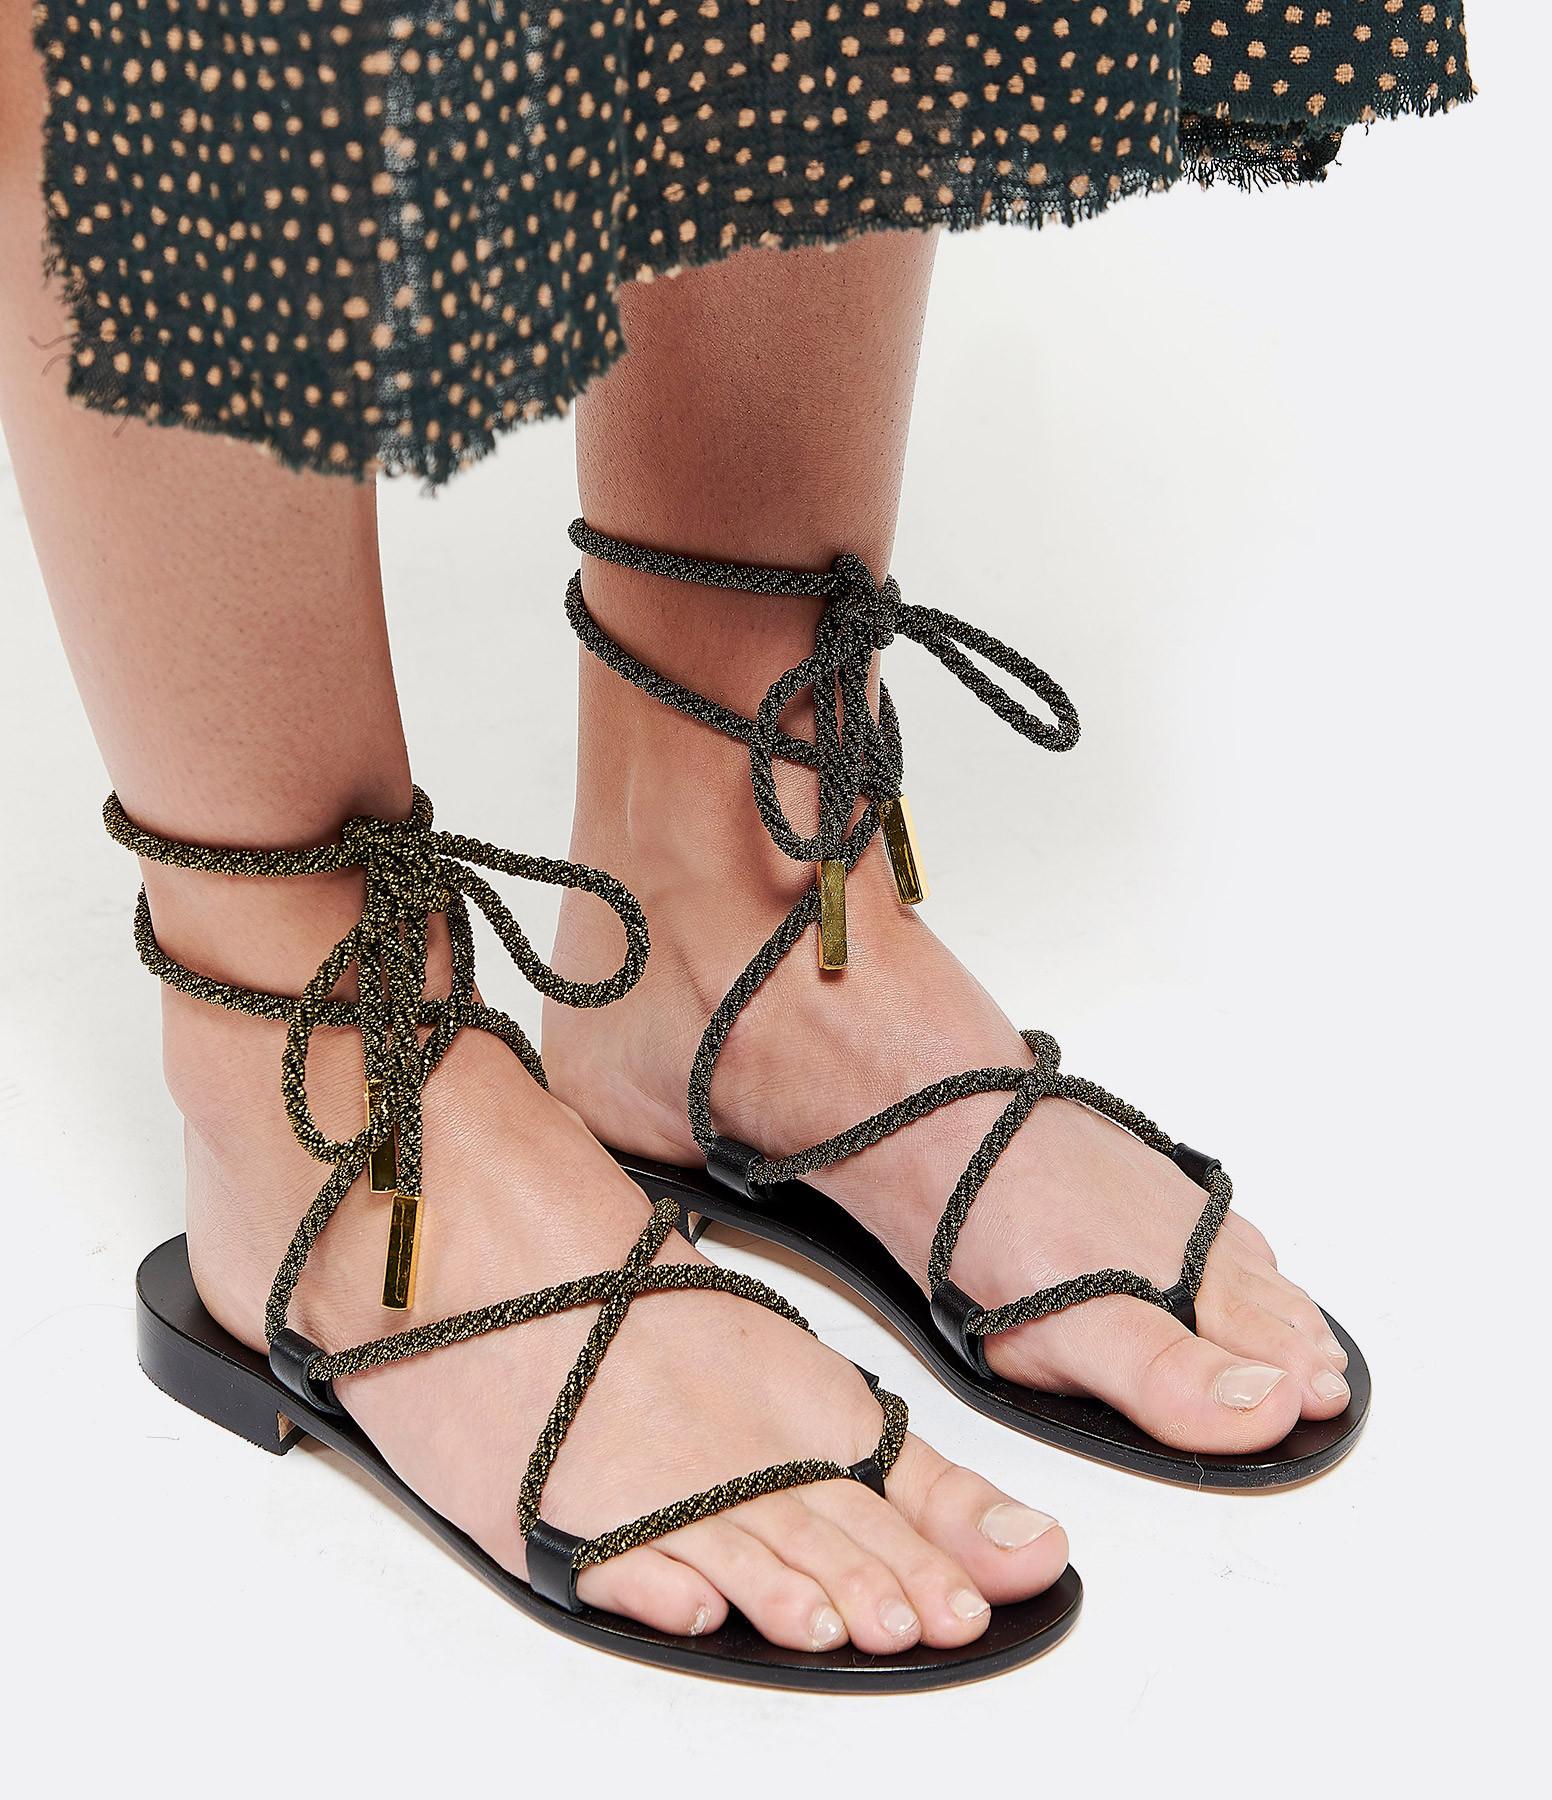 TARAH BLANCHE - Cordes Sandales Bronze